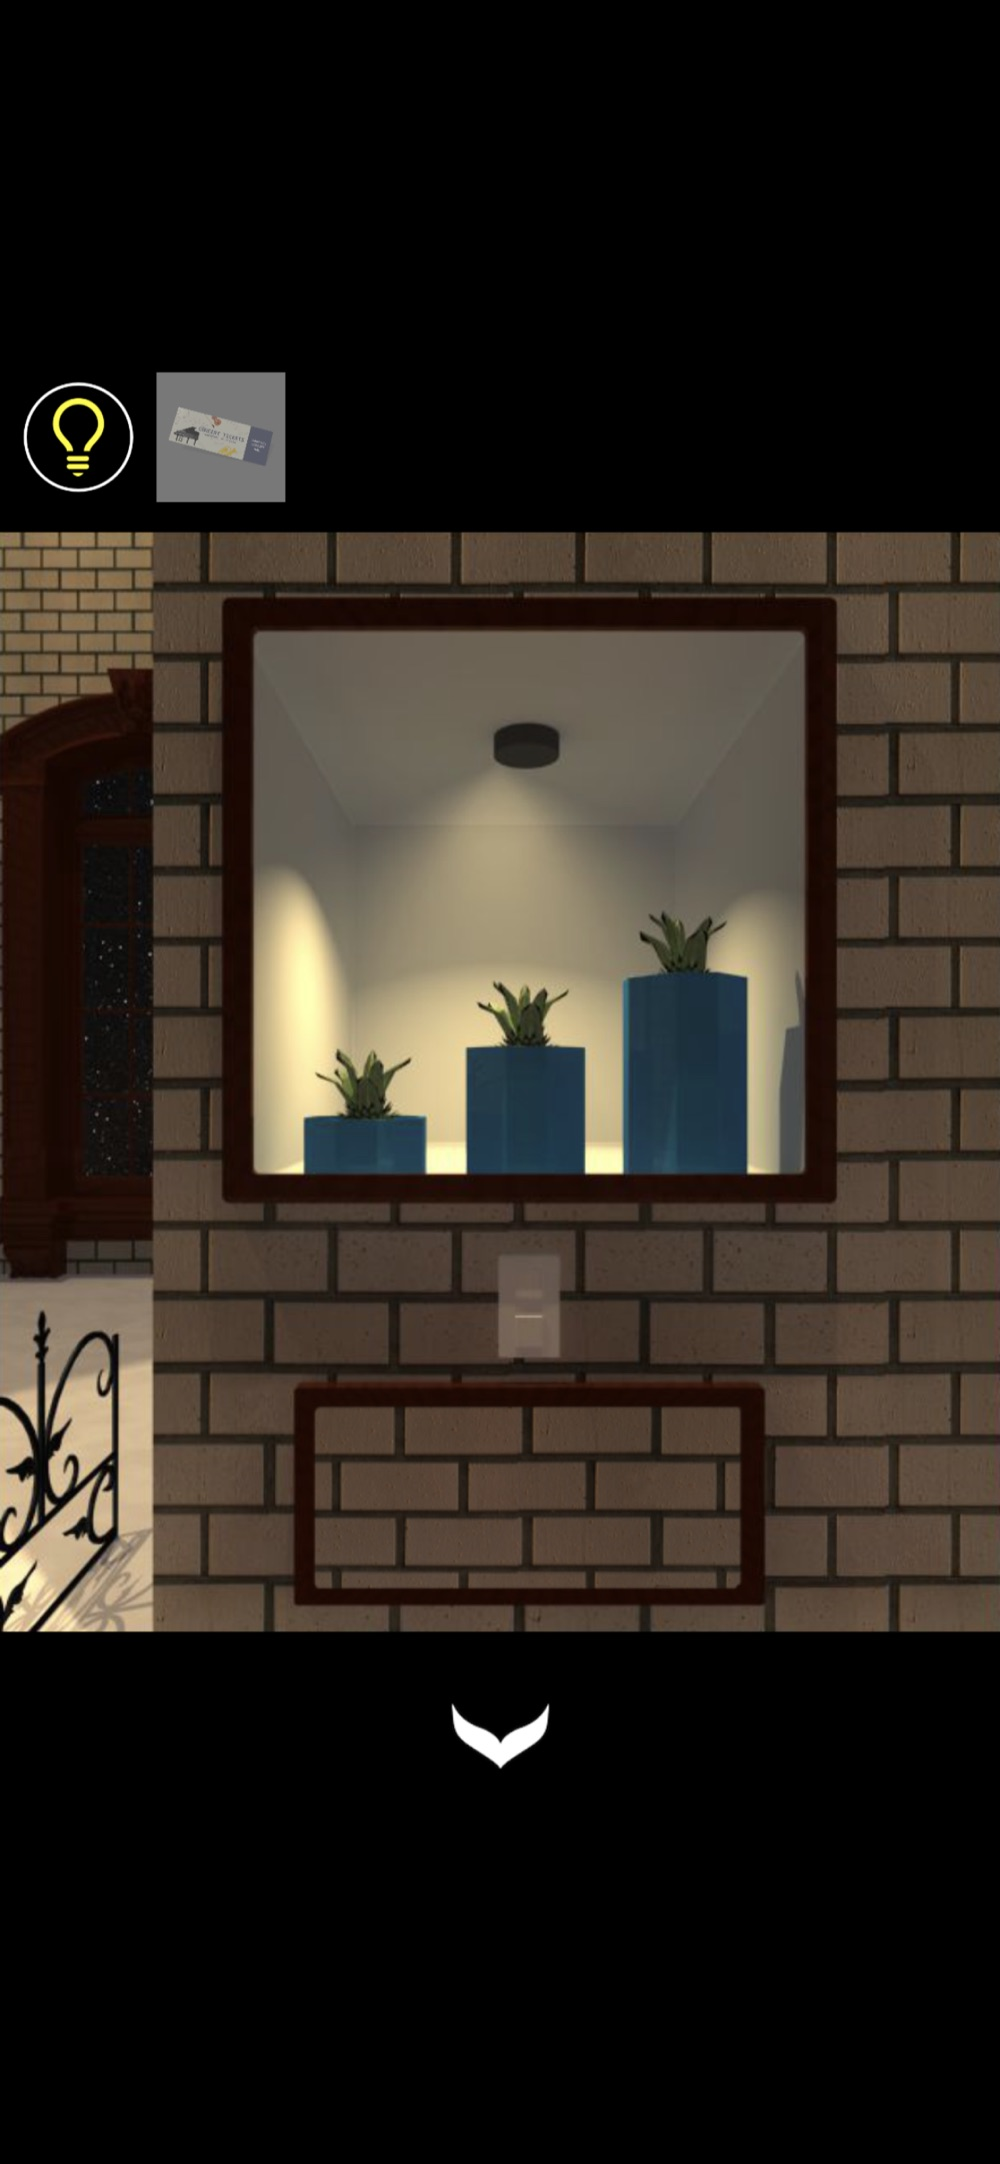 Prison Games - Escape Rooms hack tool